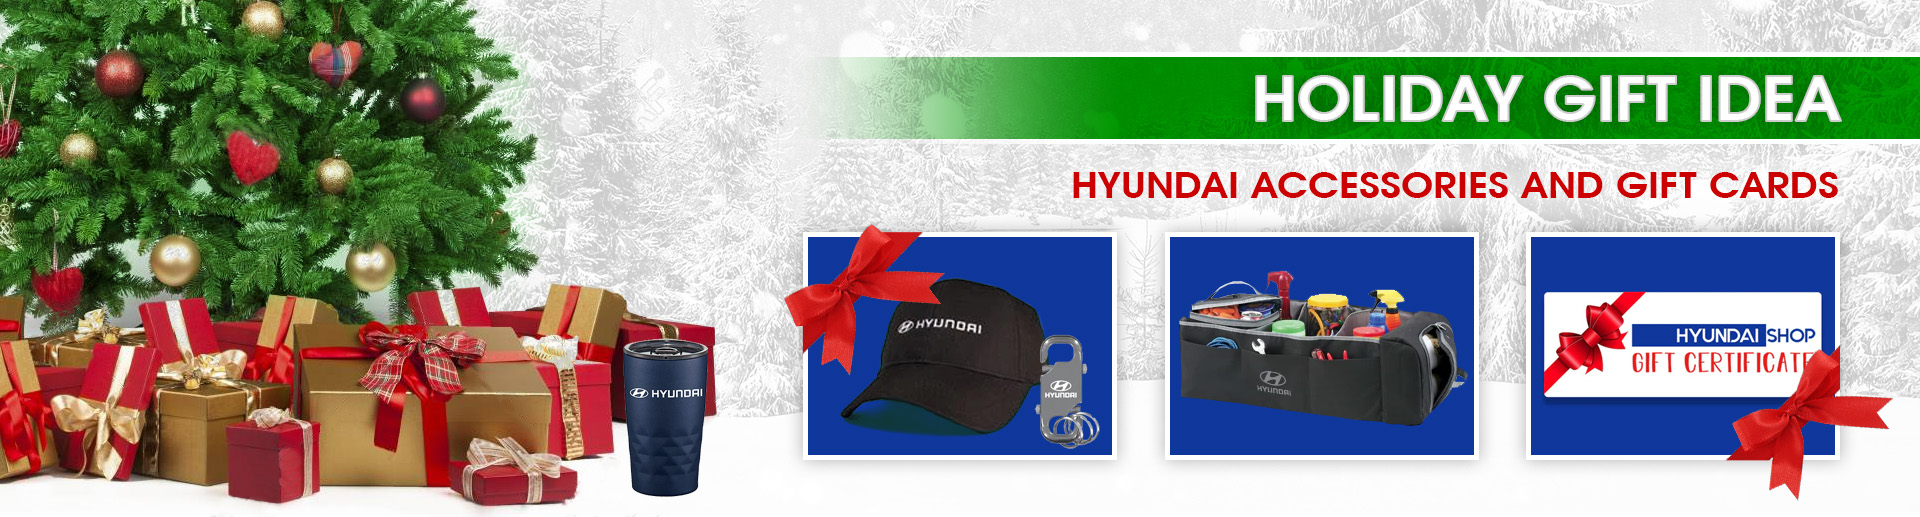 HyundaiShop Gift Guide